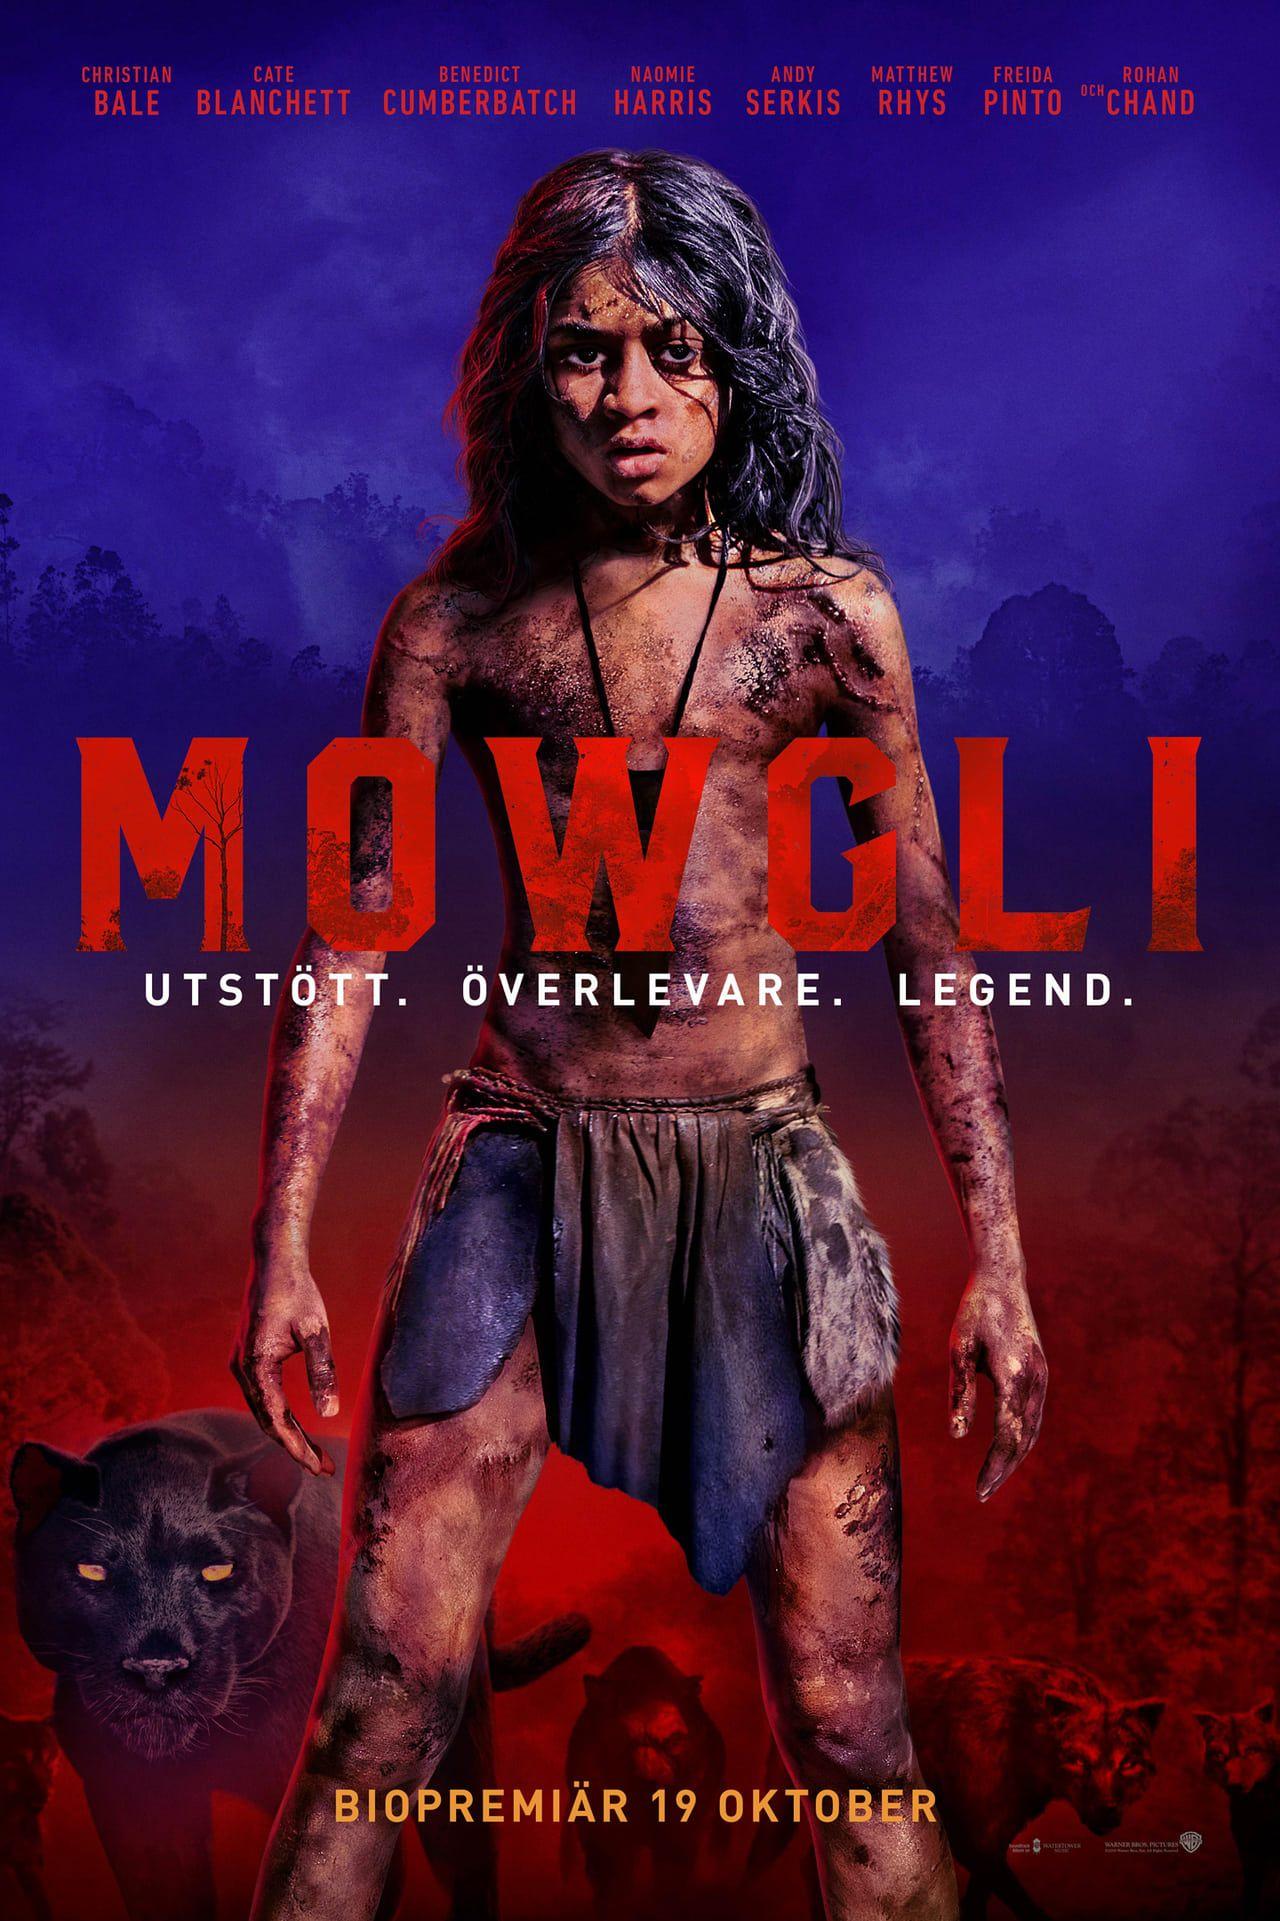 Regarder Mowgli 2017 Streaming Vf Gratuit Film Complet En Francais Mowgli Film Films Complets Disney Cinema